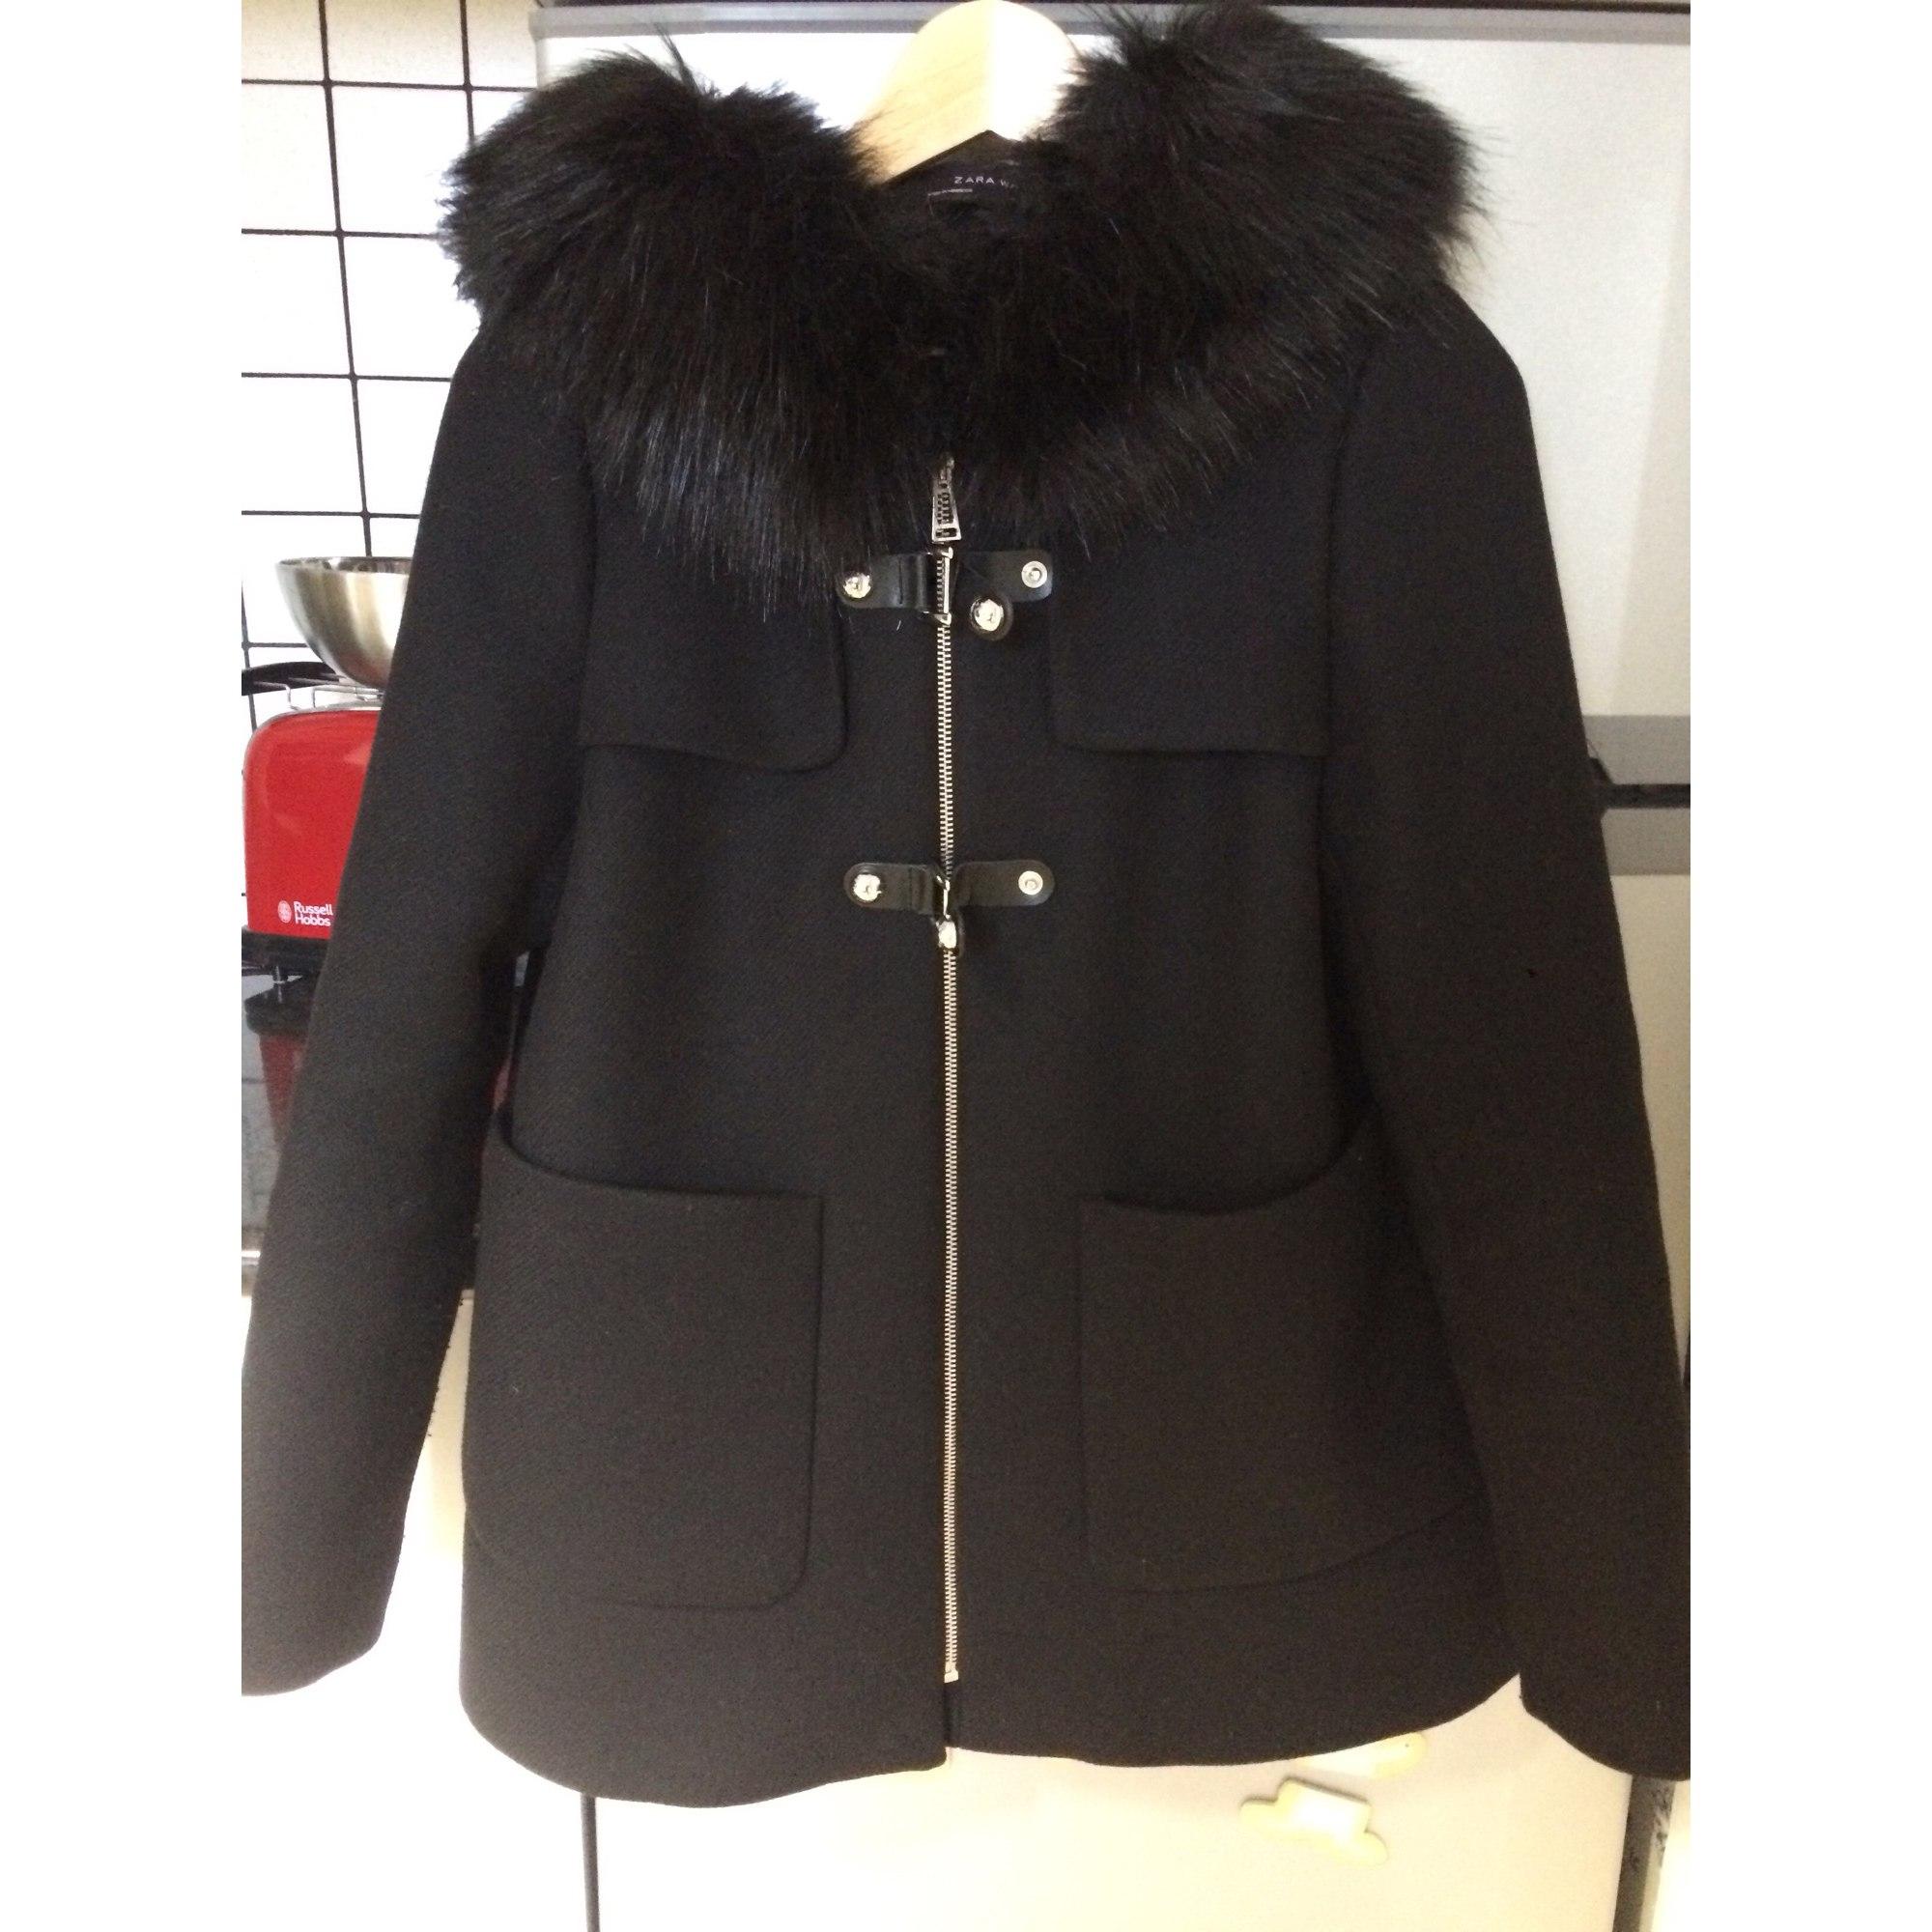 boucle manteau zara manteau zara noir noir manteau boucle reCodxB